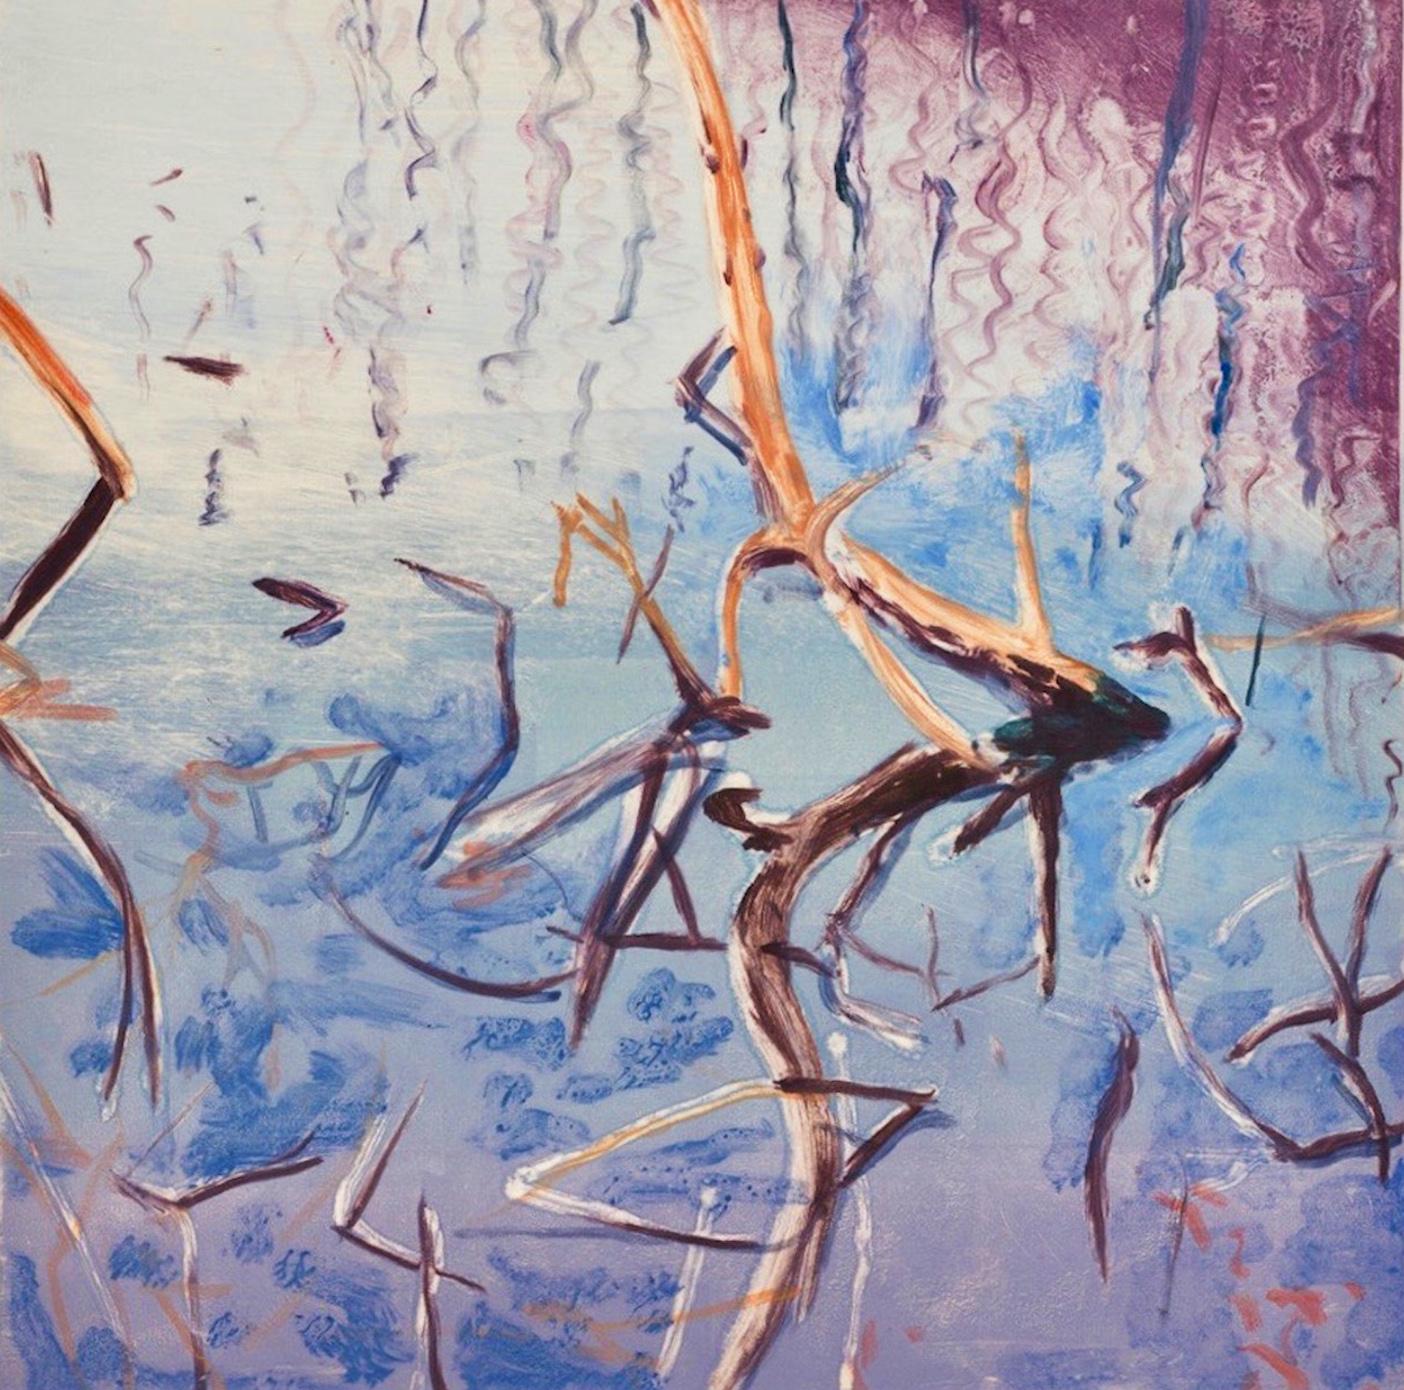 Phil Garrett: Tom's Pond Variation VI